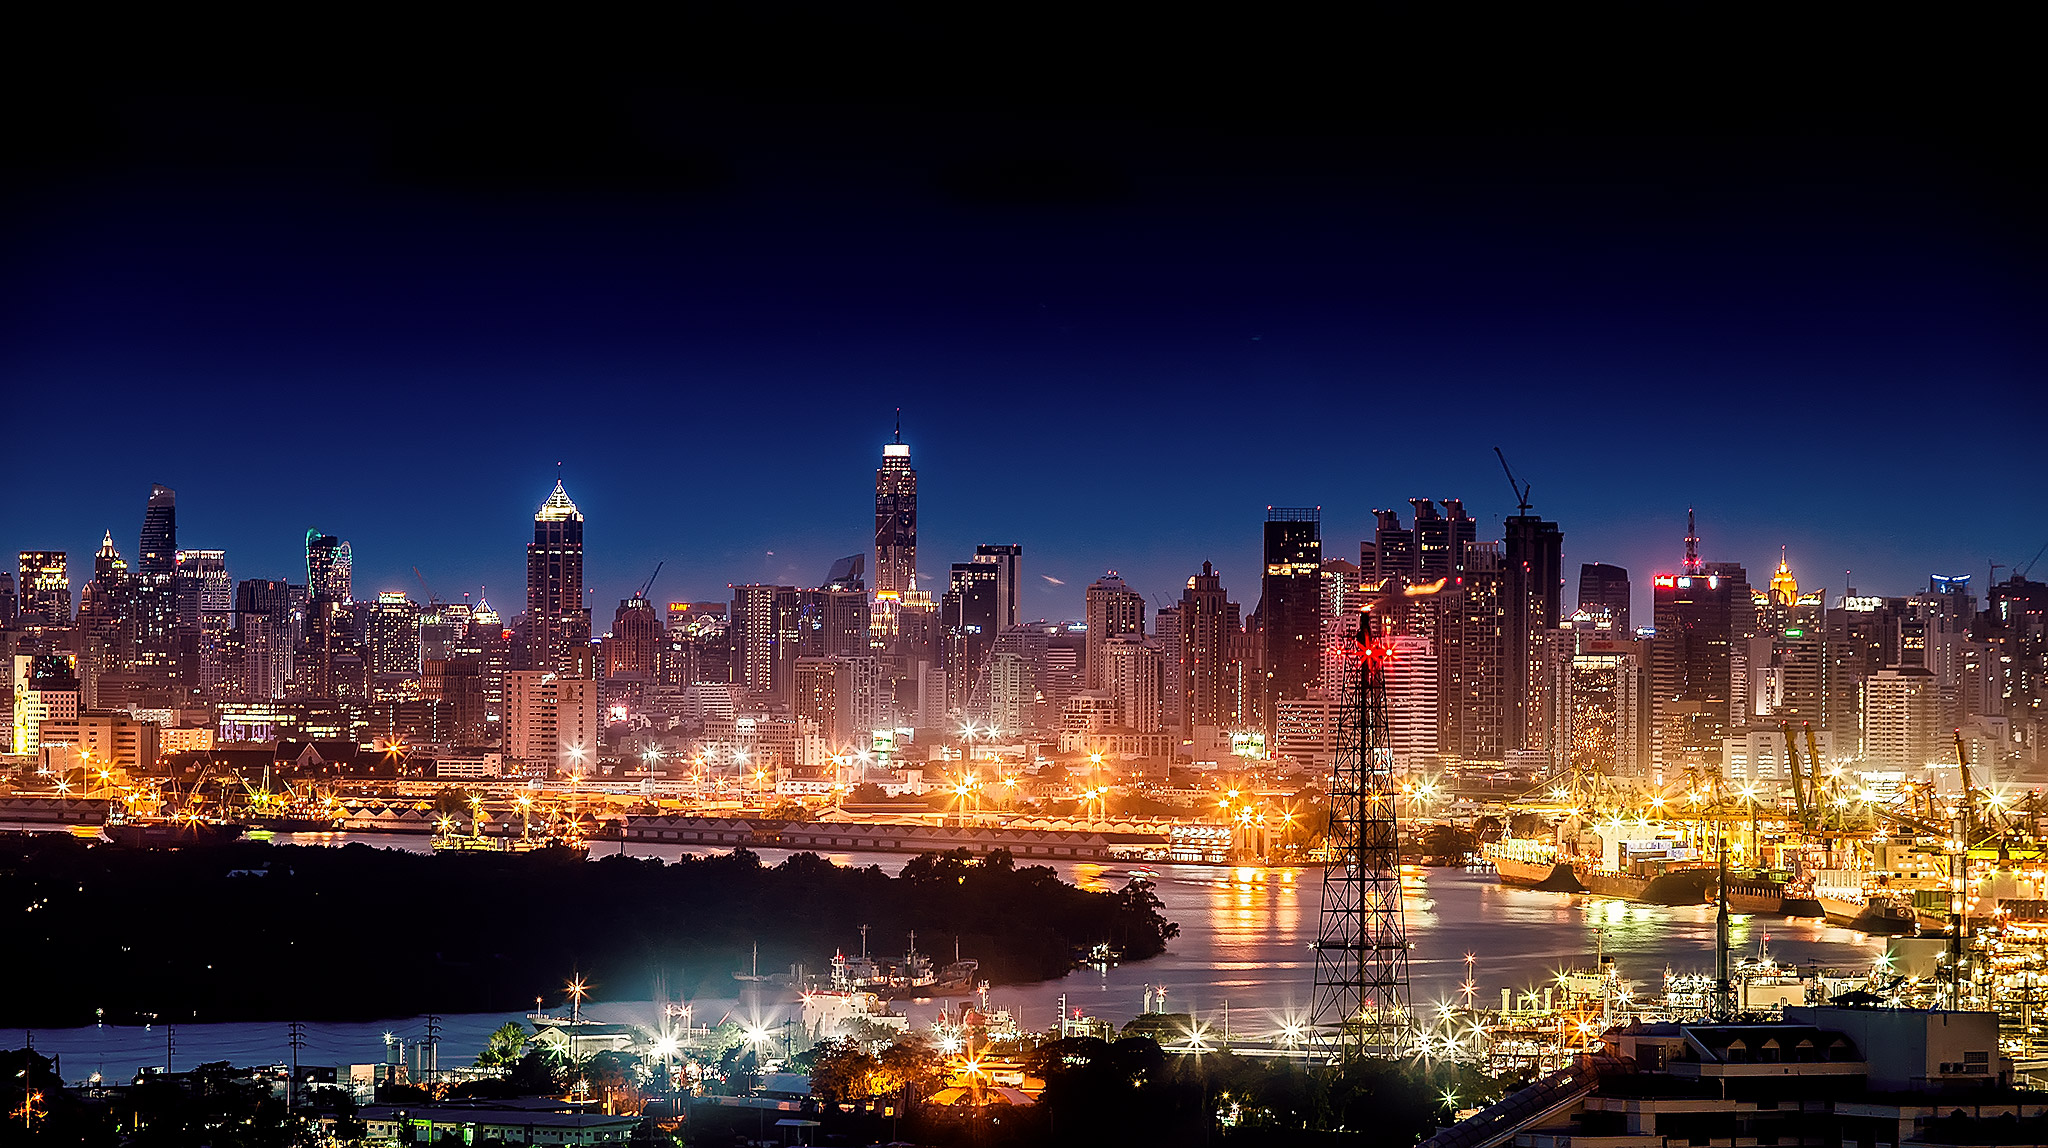 Panoramic View of City Lit Up at Night  Free Stock Photo